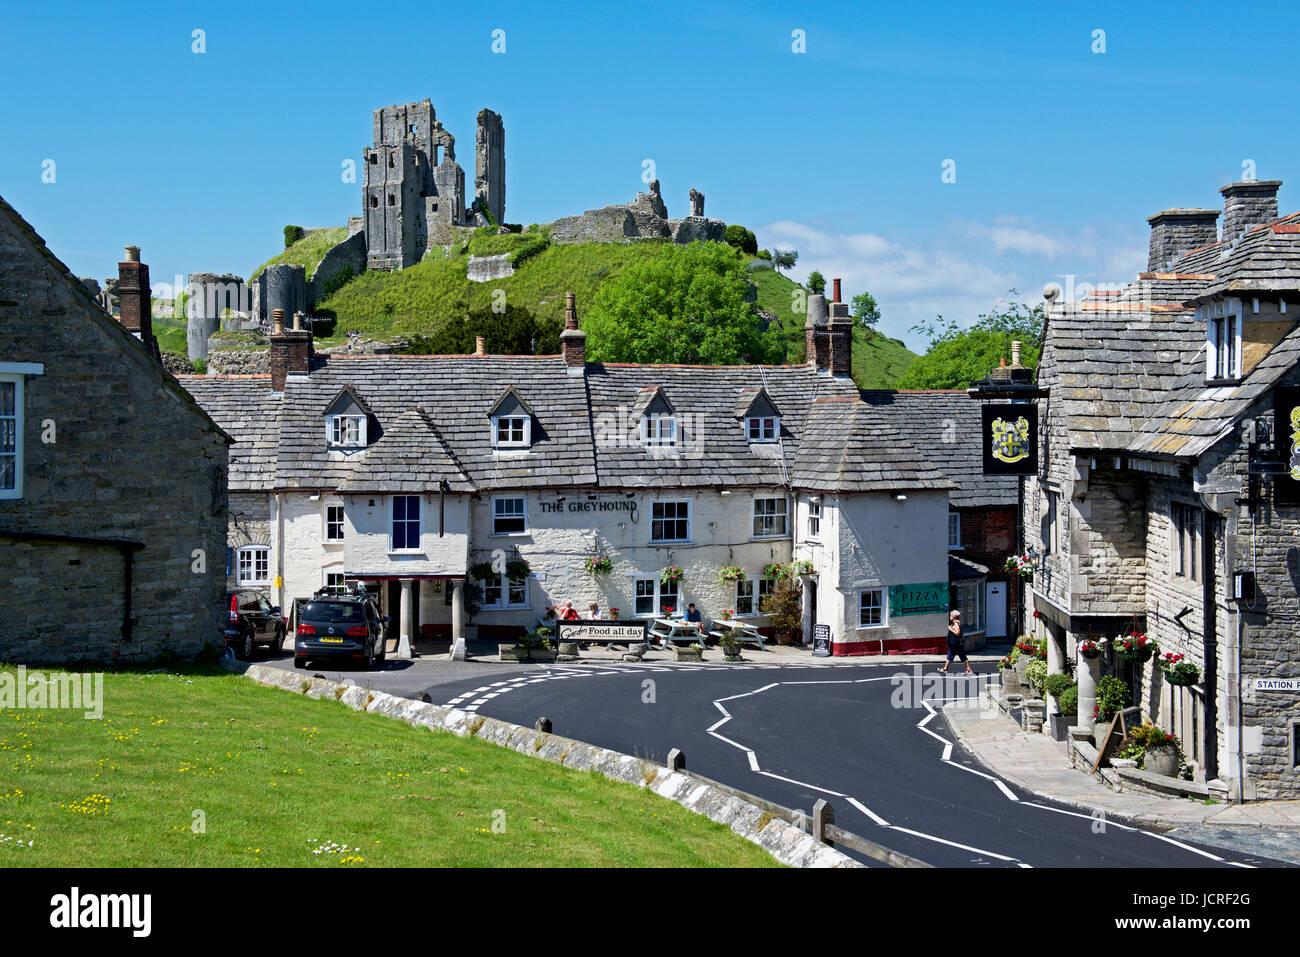 The village of Corfe Castle, Dorset, England UK - Stock Image